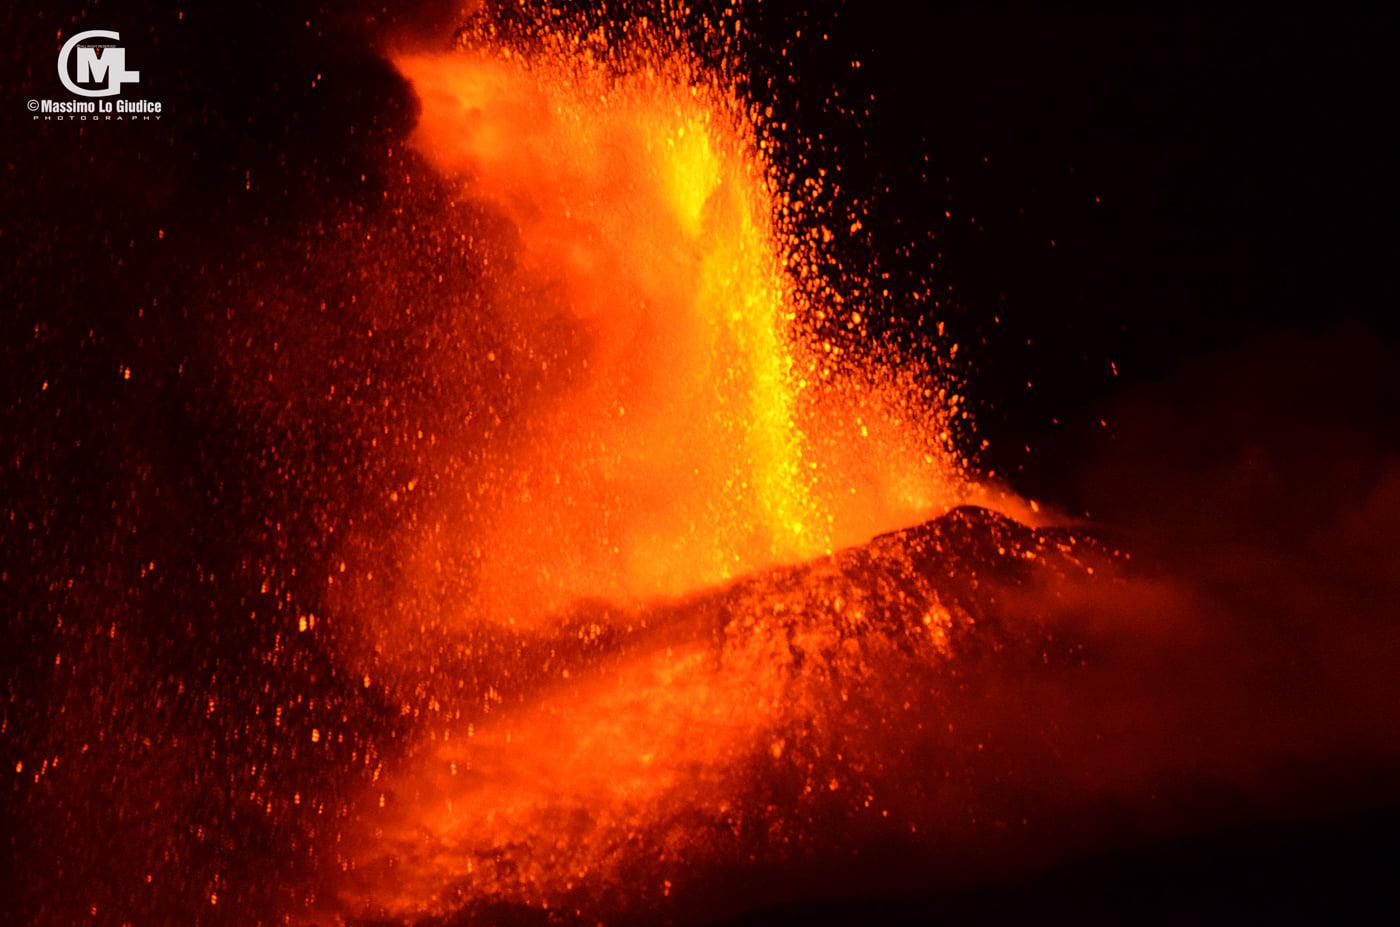 Etna's lava fountain during the 13th paroxysm this morning (image: Massimo Lo Giudice / facebook)